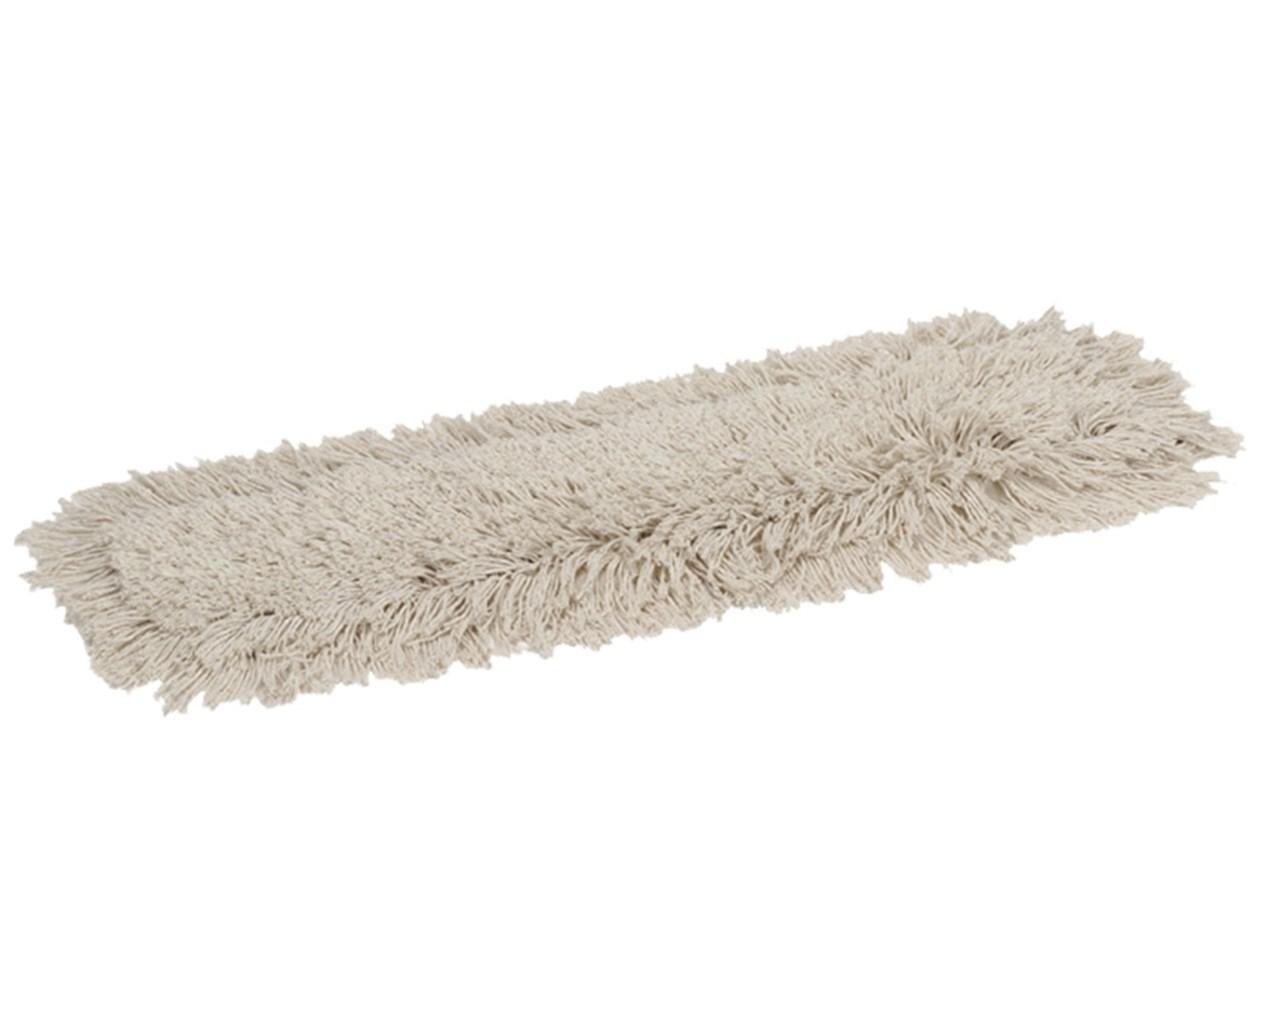 Dustmate 60cm Floor Kit Ramon Hygiene Kit802